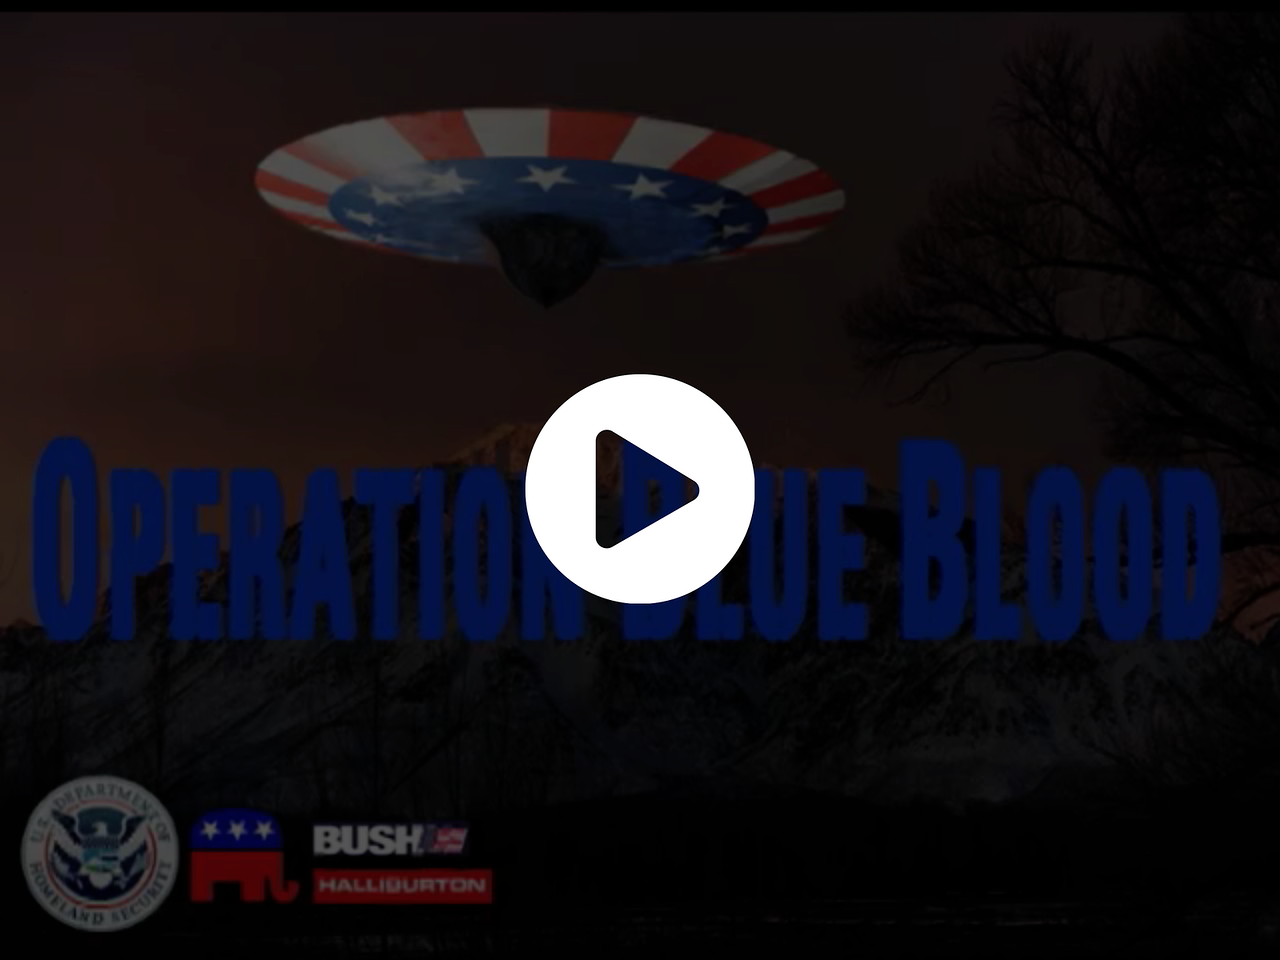 Fulana, Operation Blue Blood